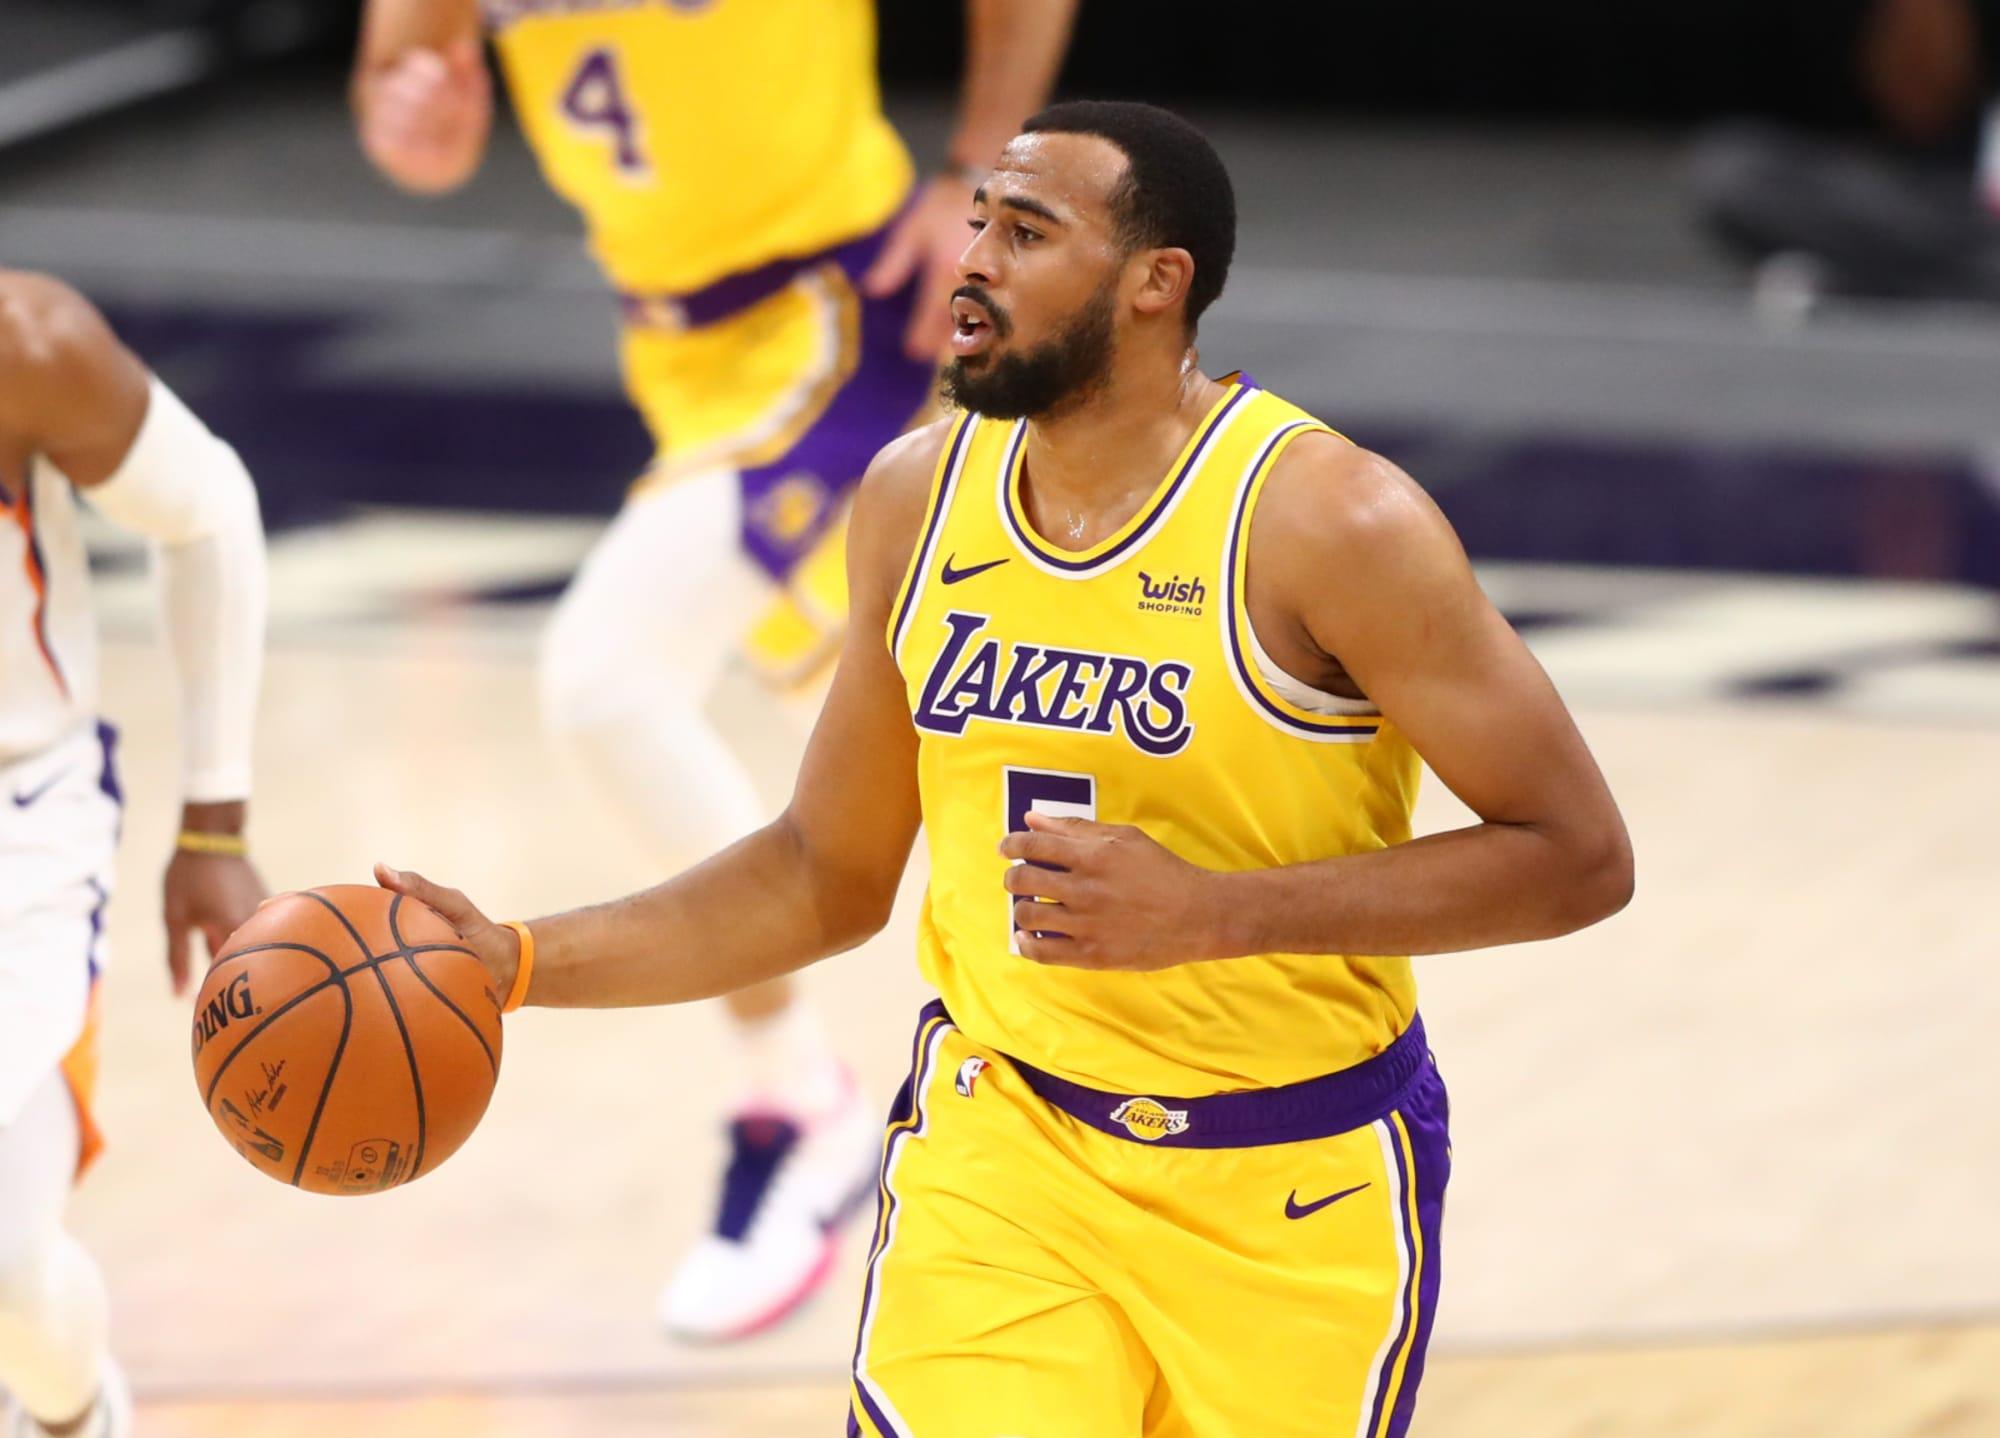 Lakers: Talen Horton-Tucker making legitimate case for greater role